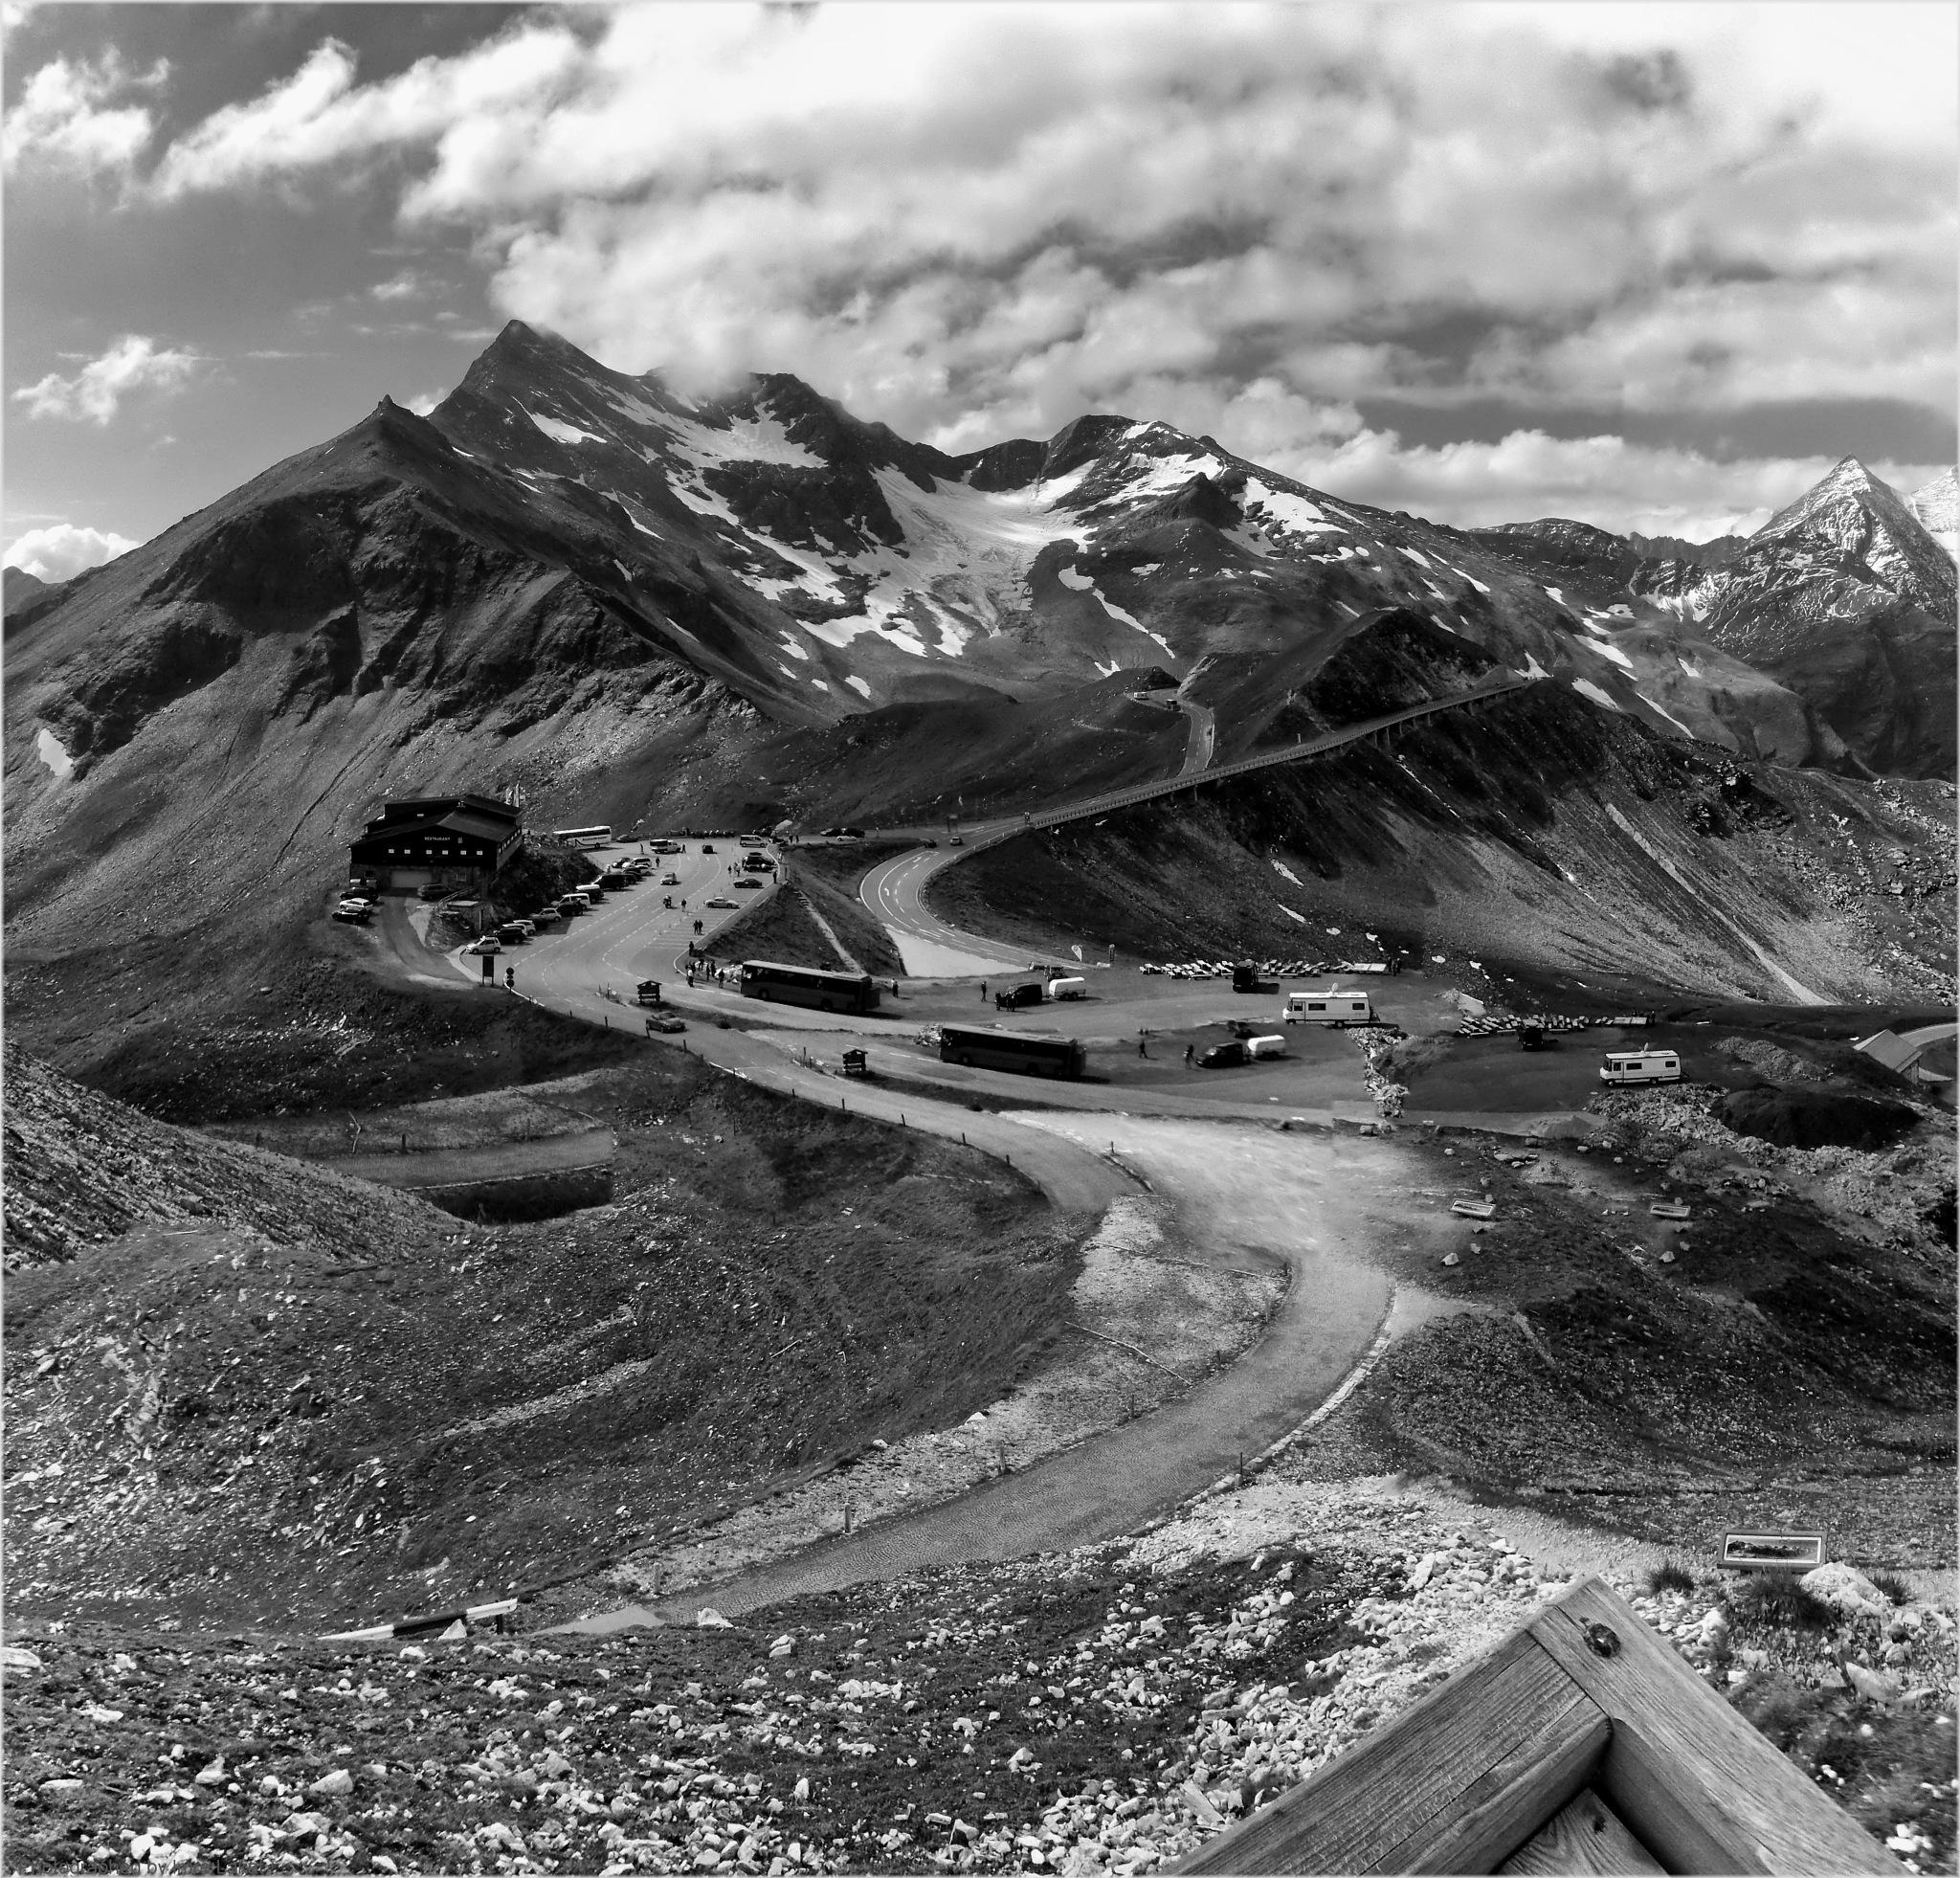 Edelweißspitze, Fusch an der Großglocknerstraße, Ausztria by Imre Lakat